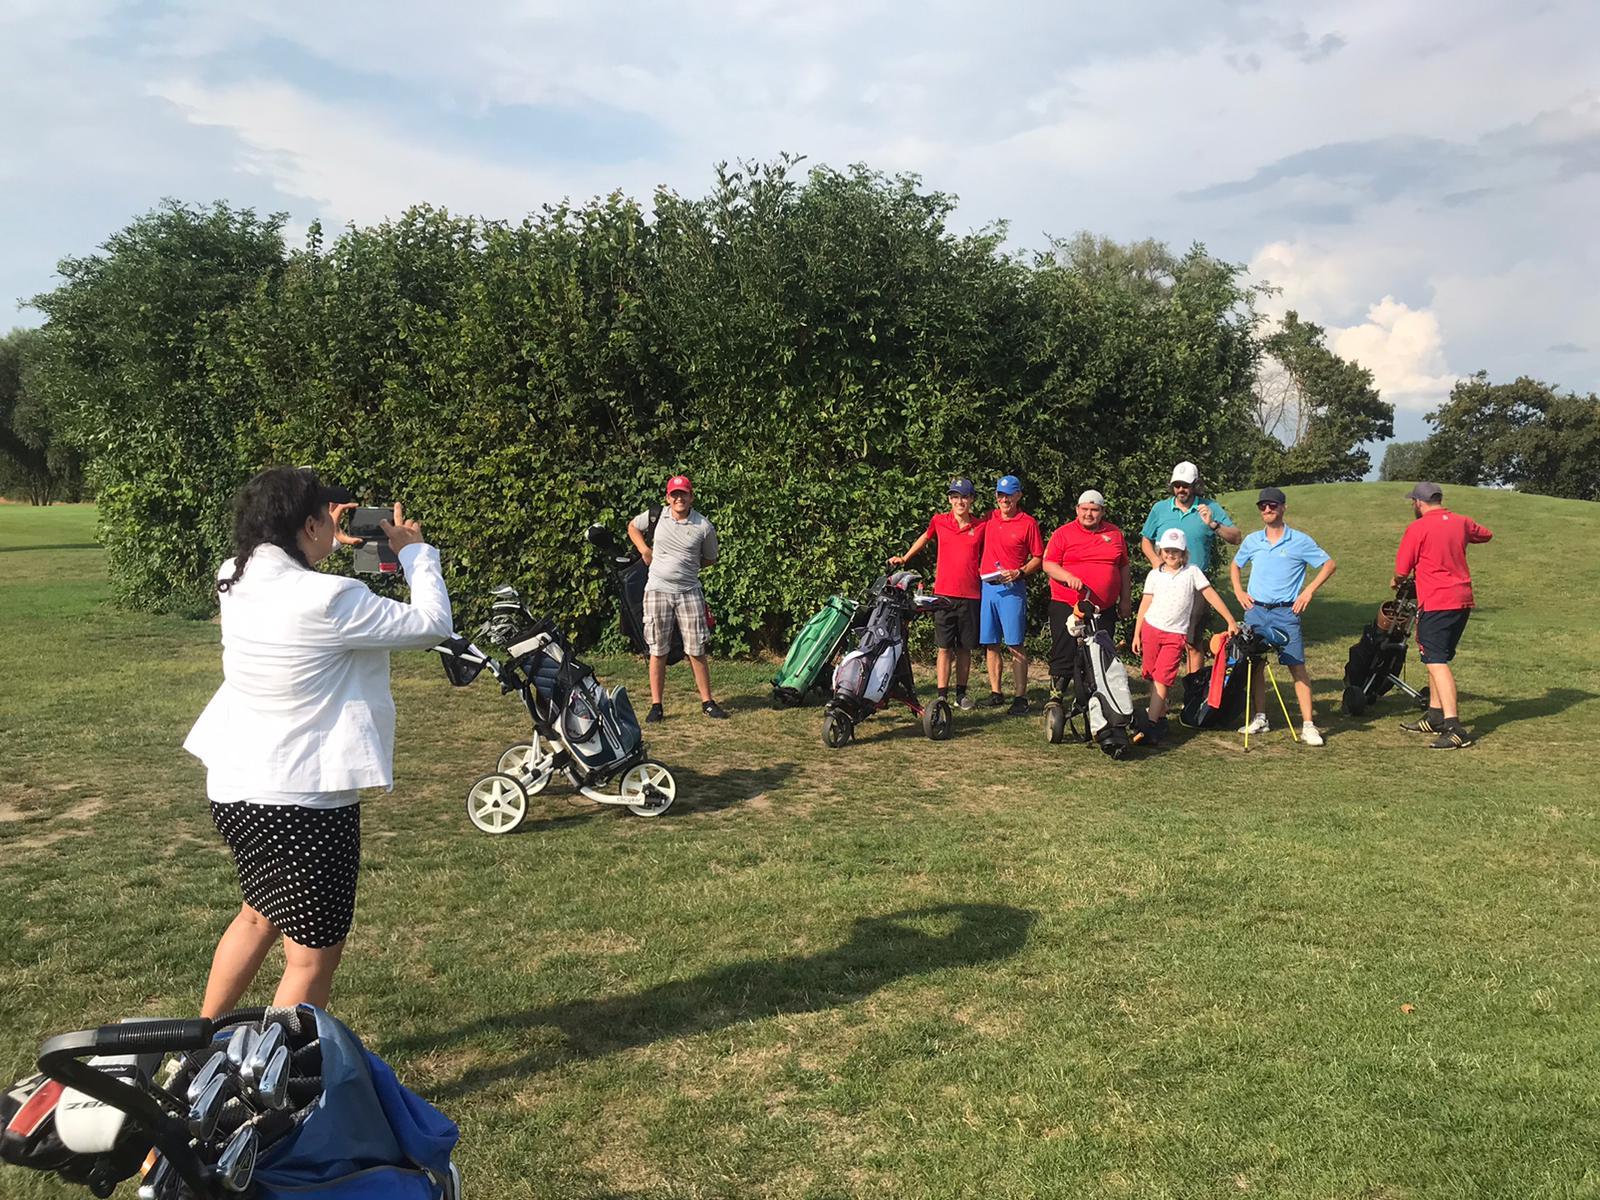 39_Golfturnier_Soroptimist_Golf_en_blanc